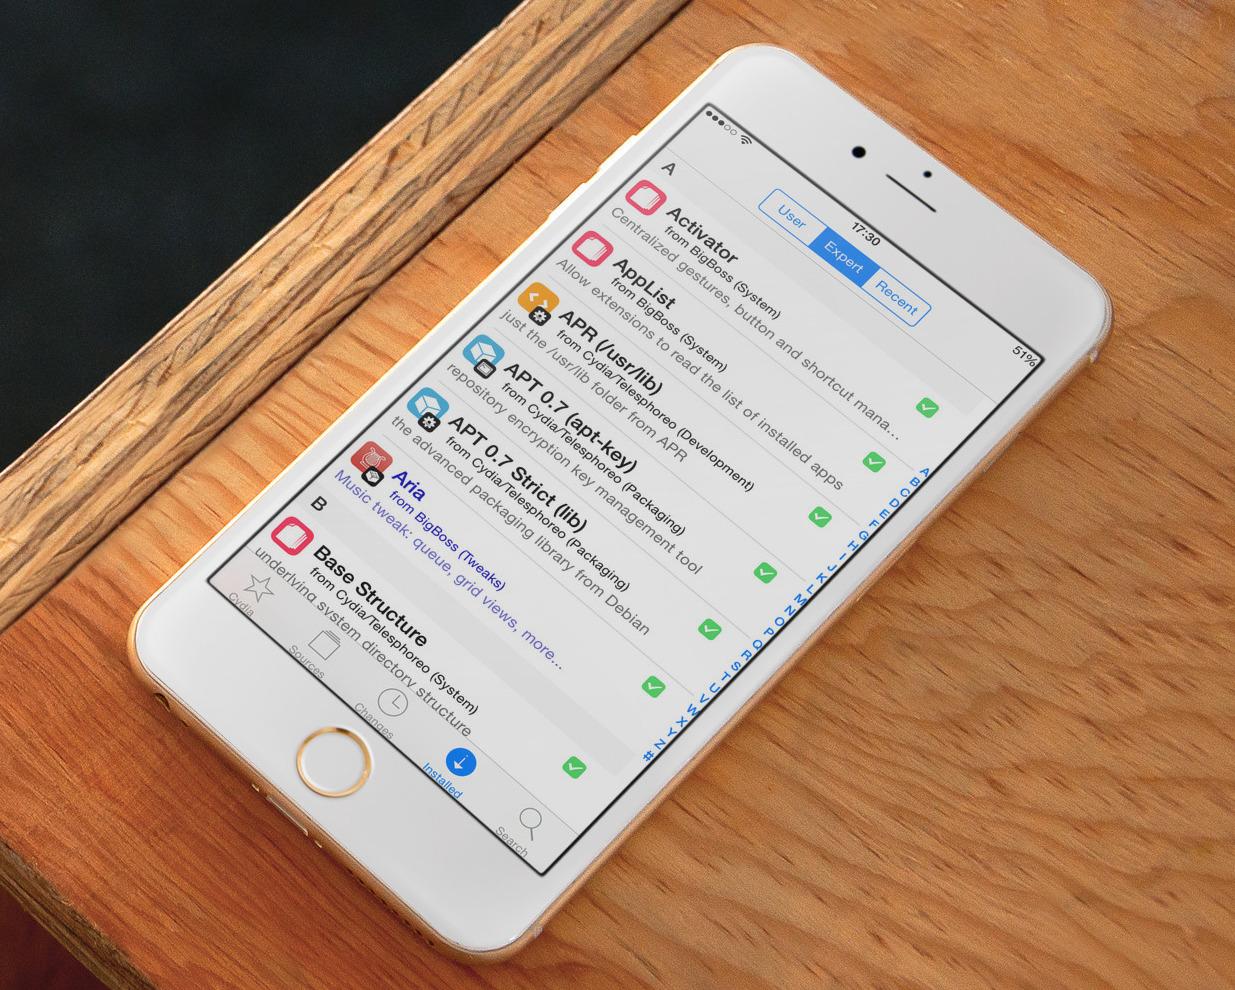 Cydia Expert mode iPhone 6